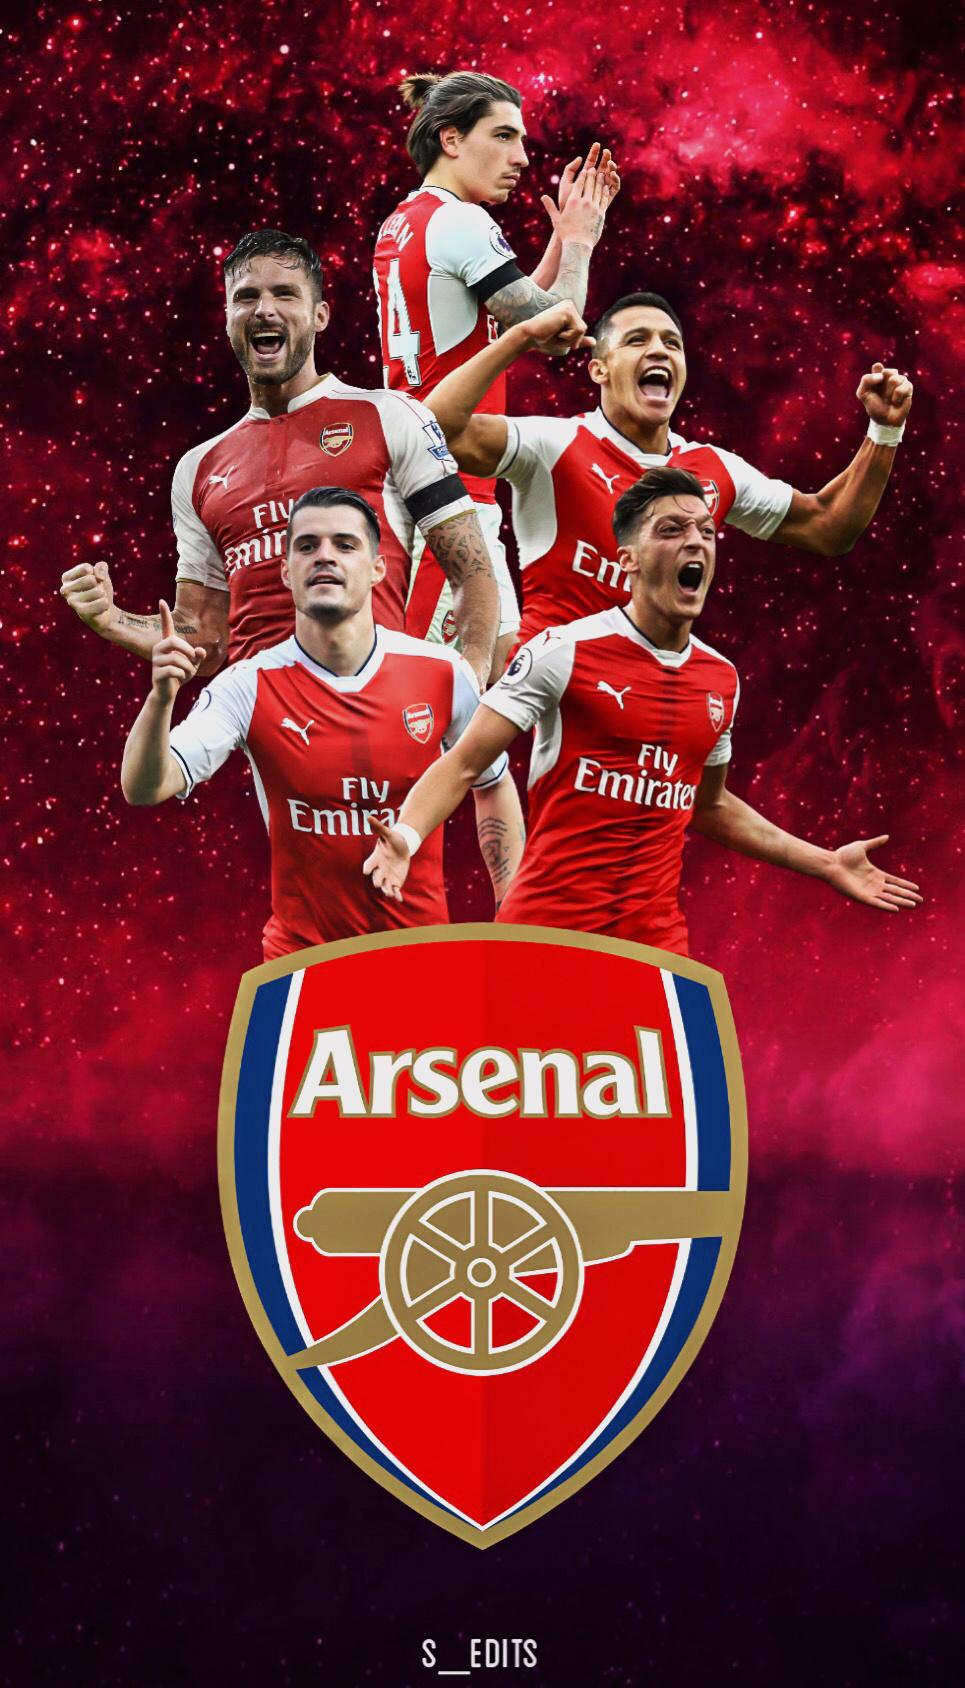 Fcb Arsenal